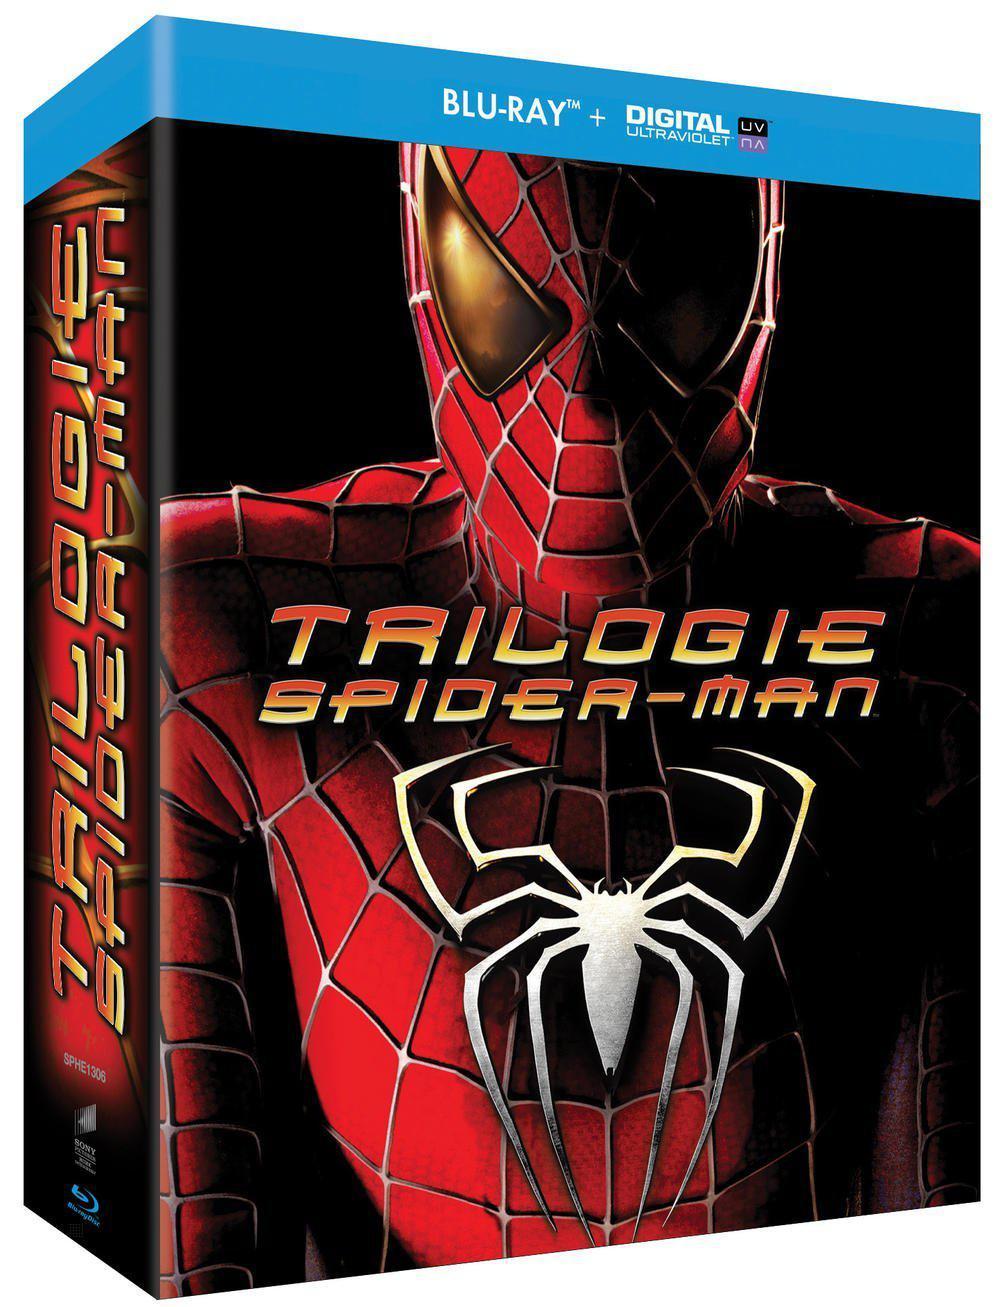 Coffret Blu-ray + Digital : Spider-Man - Trilogie